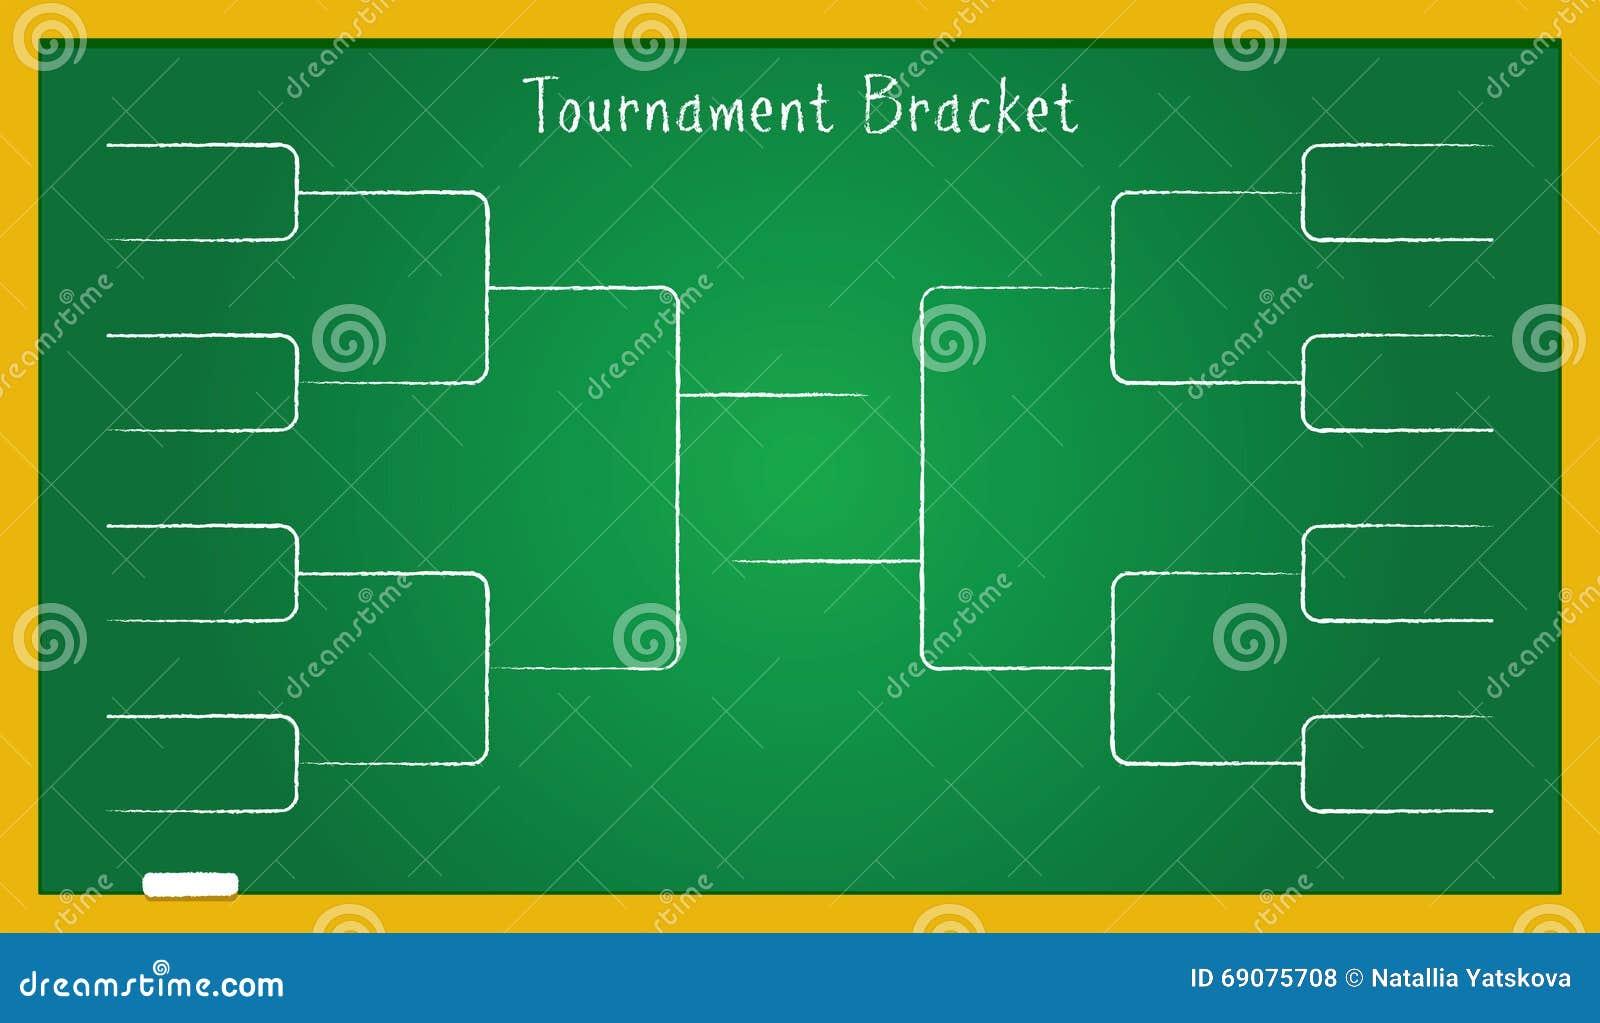 tournament bracket on school board stock vector